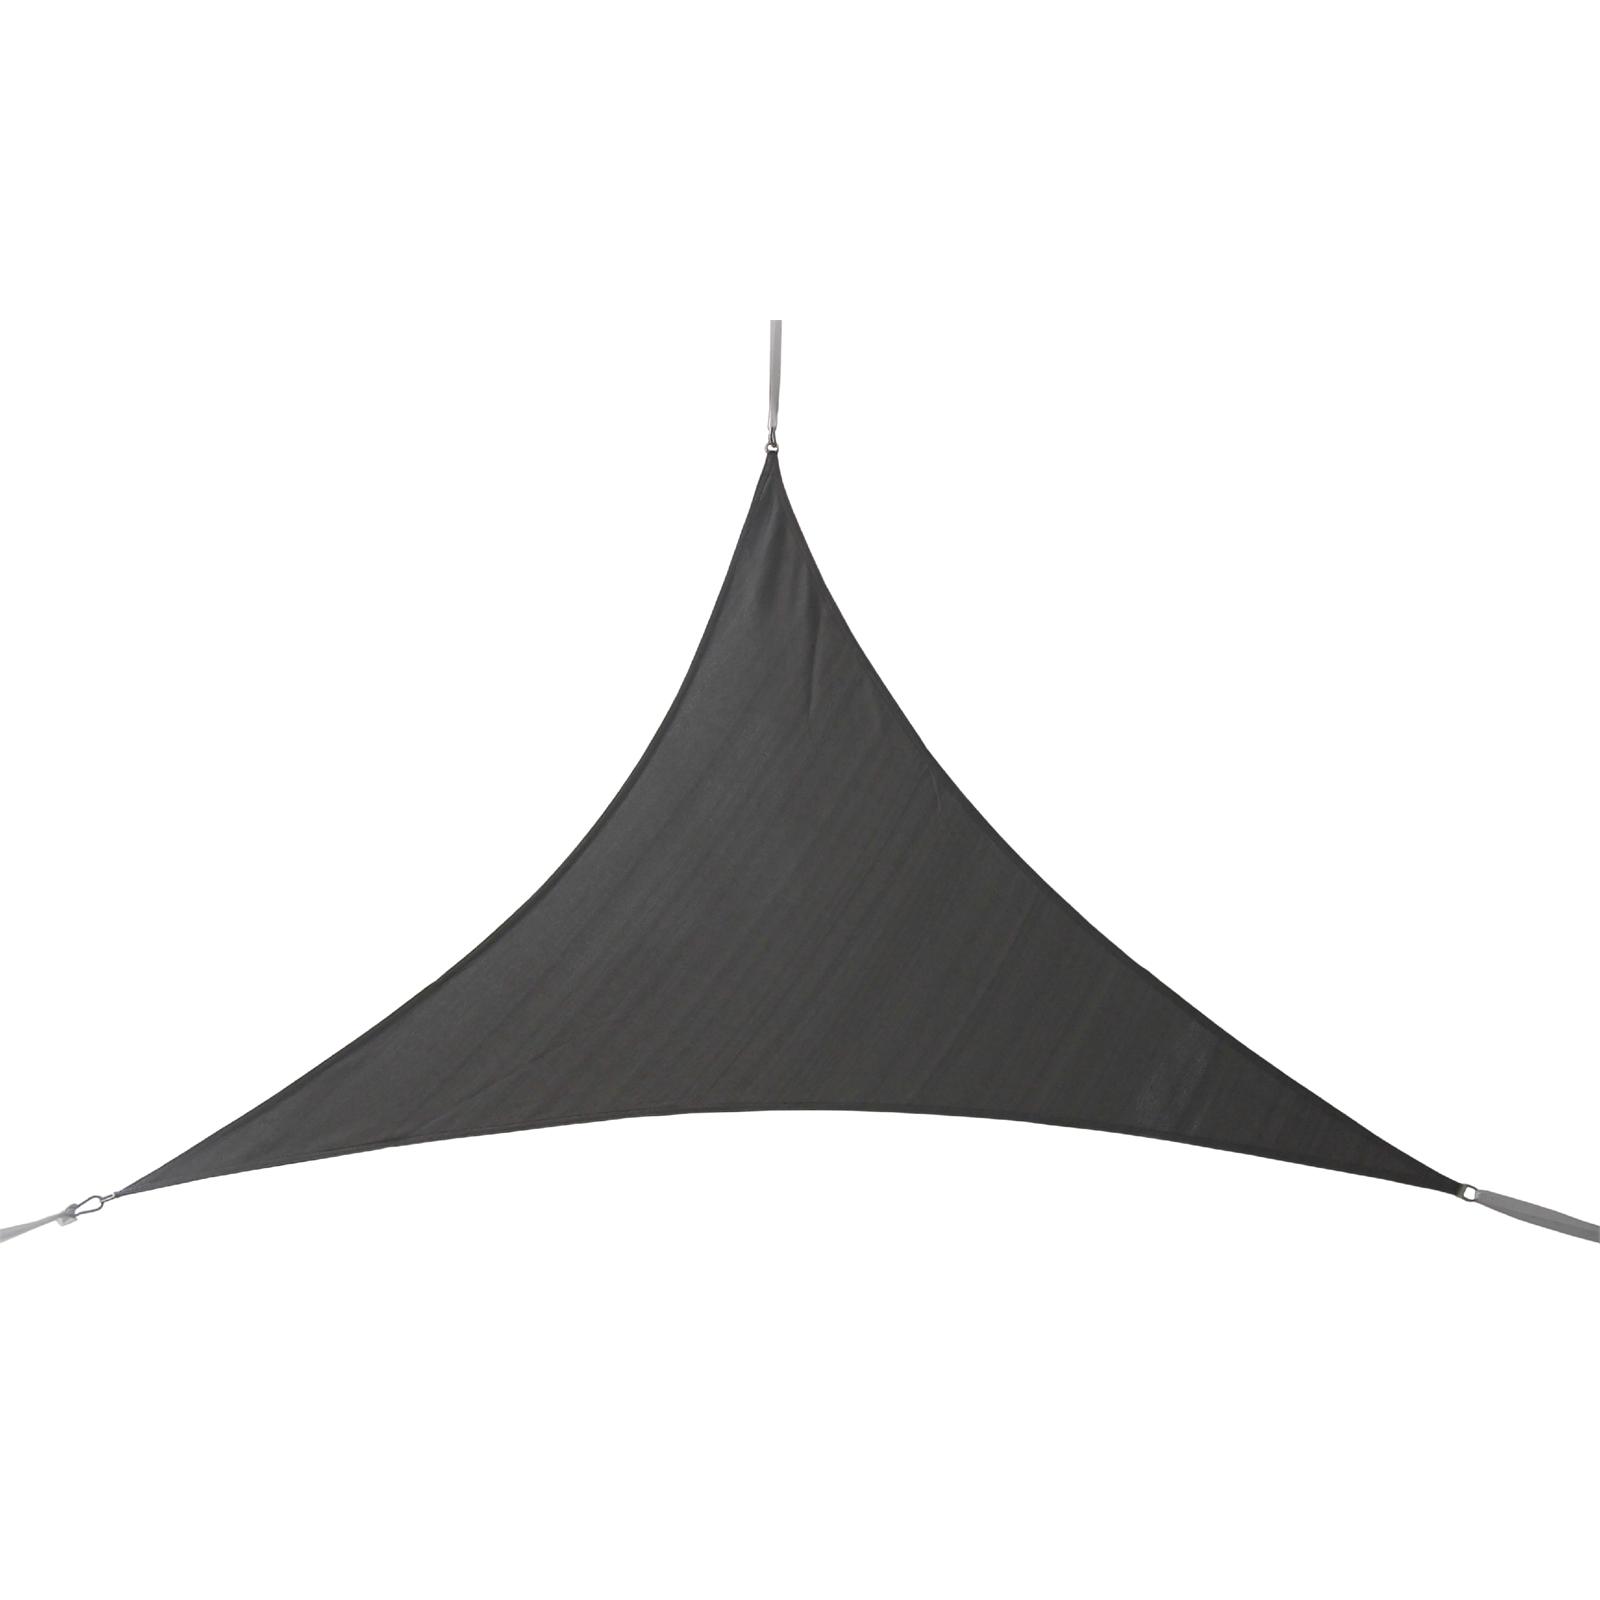 Marquee 3 x 3m Charcoal Triangle Shade Sail